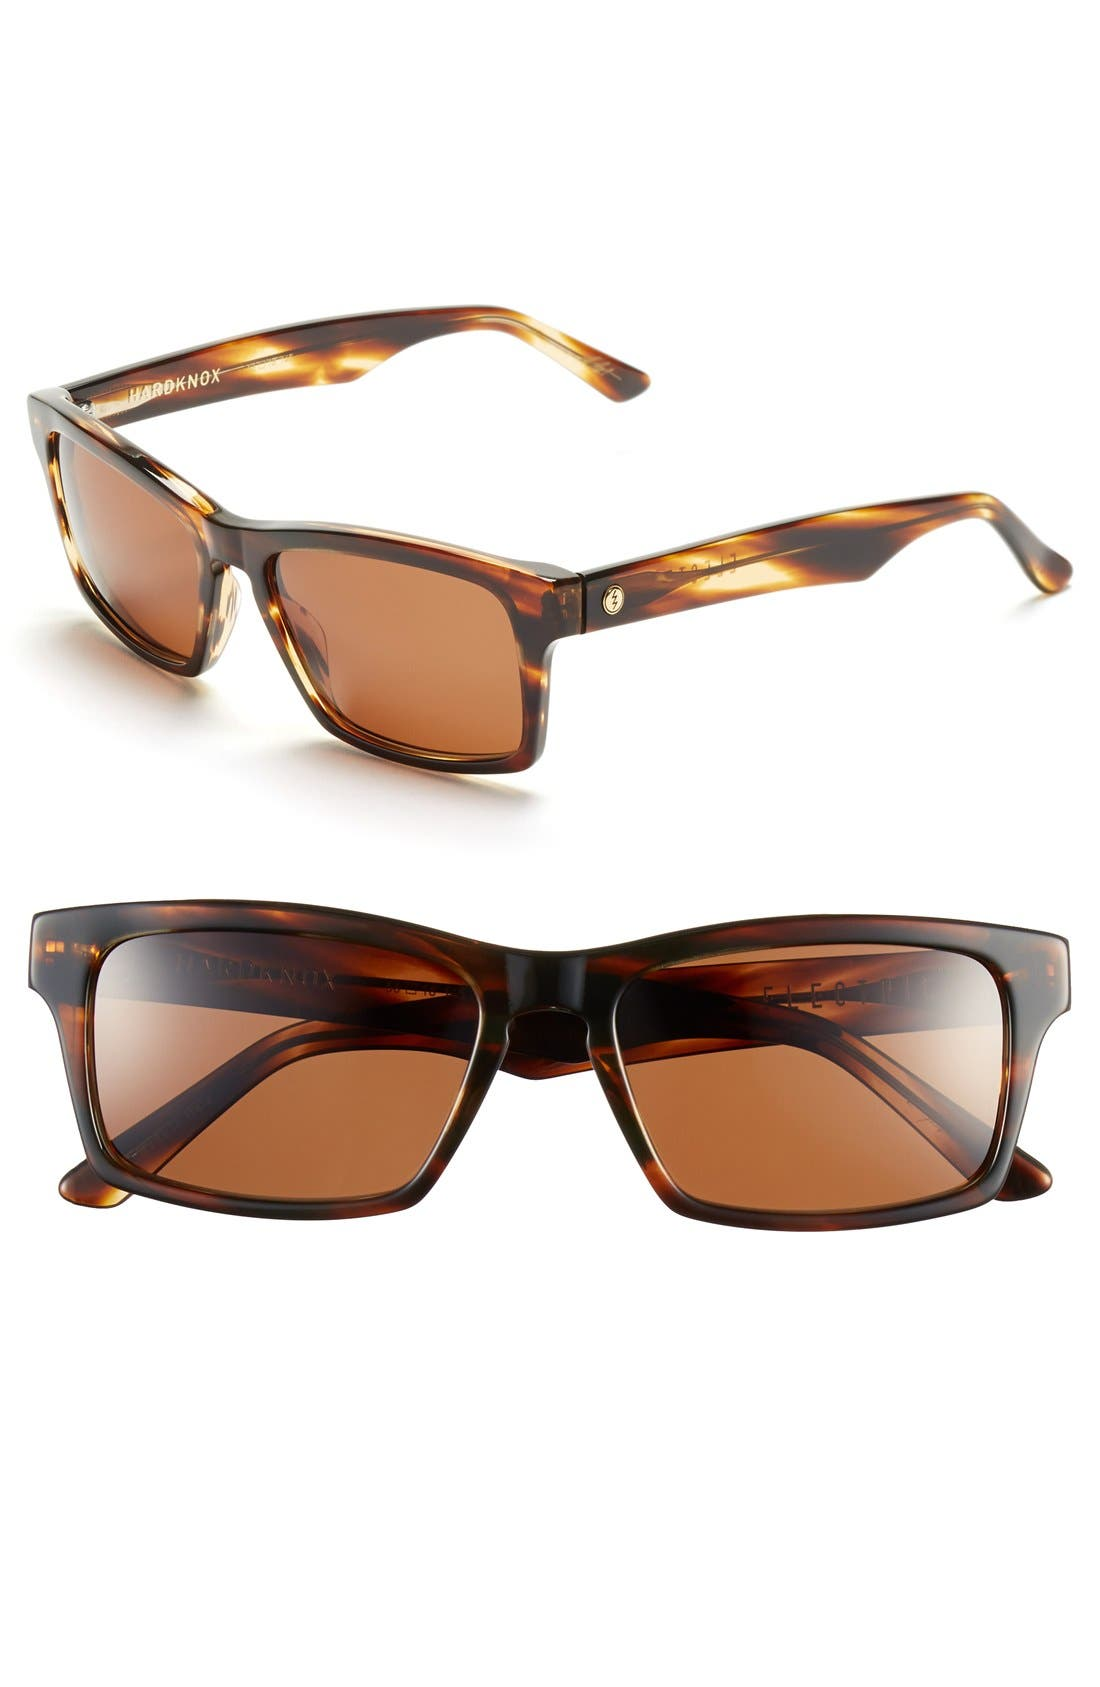 ELECTRIC 'Hardknox' 56mm Sunglasses